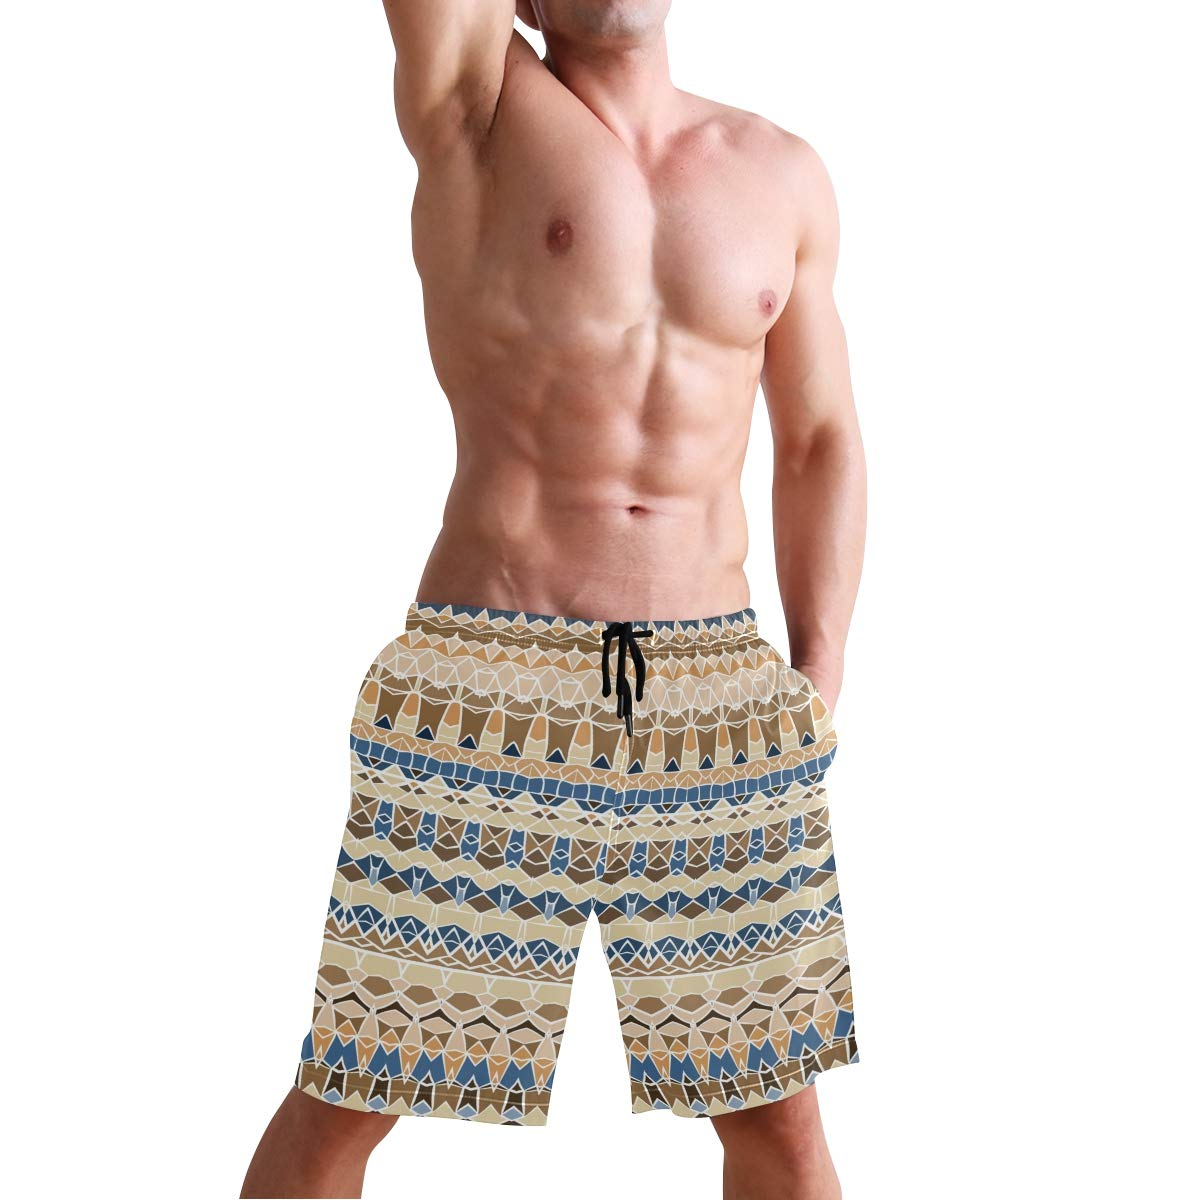 Mens Beach Swim Trunks Africa Art Boxer Swimsuit Underwear Board Shorts with Pocket